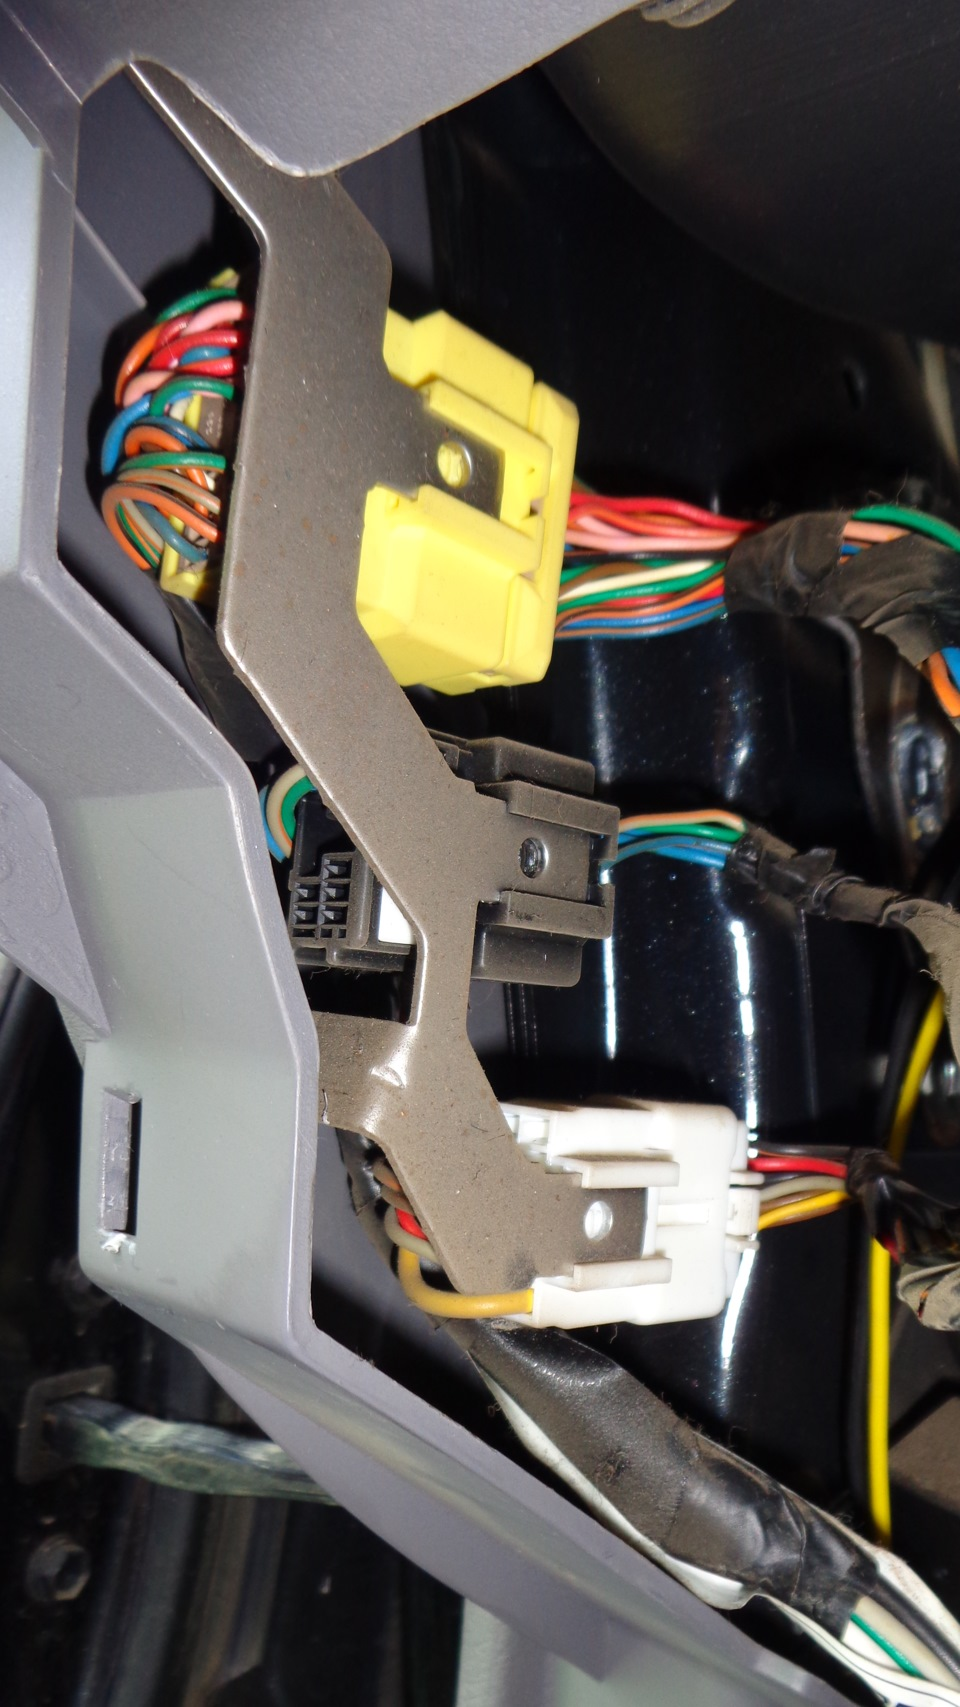 внутренняя схема реле эптф в аавто